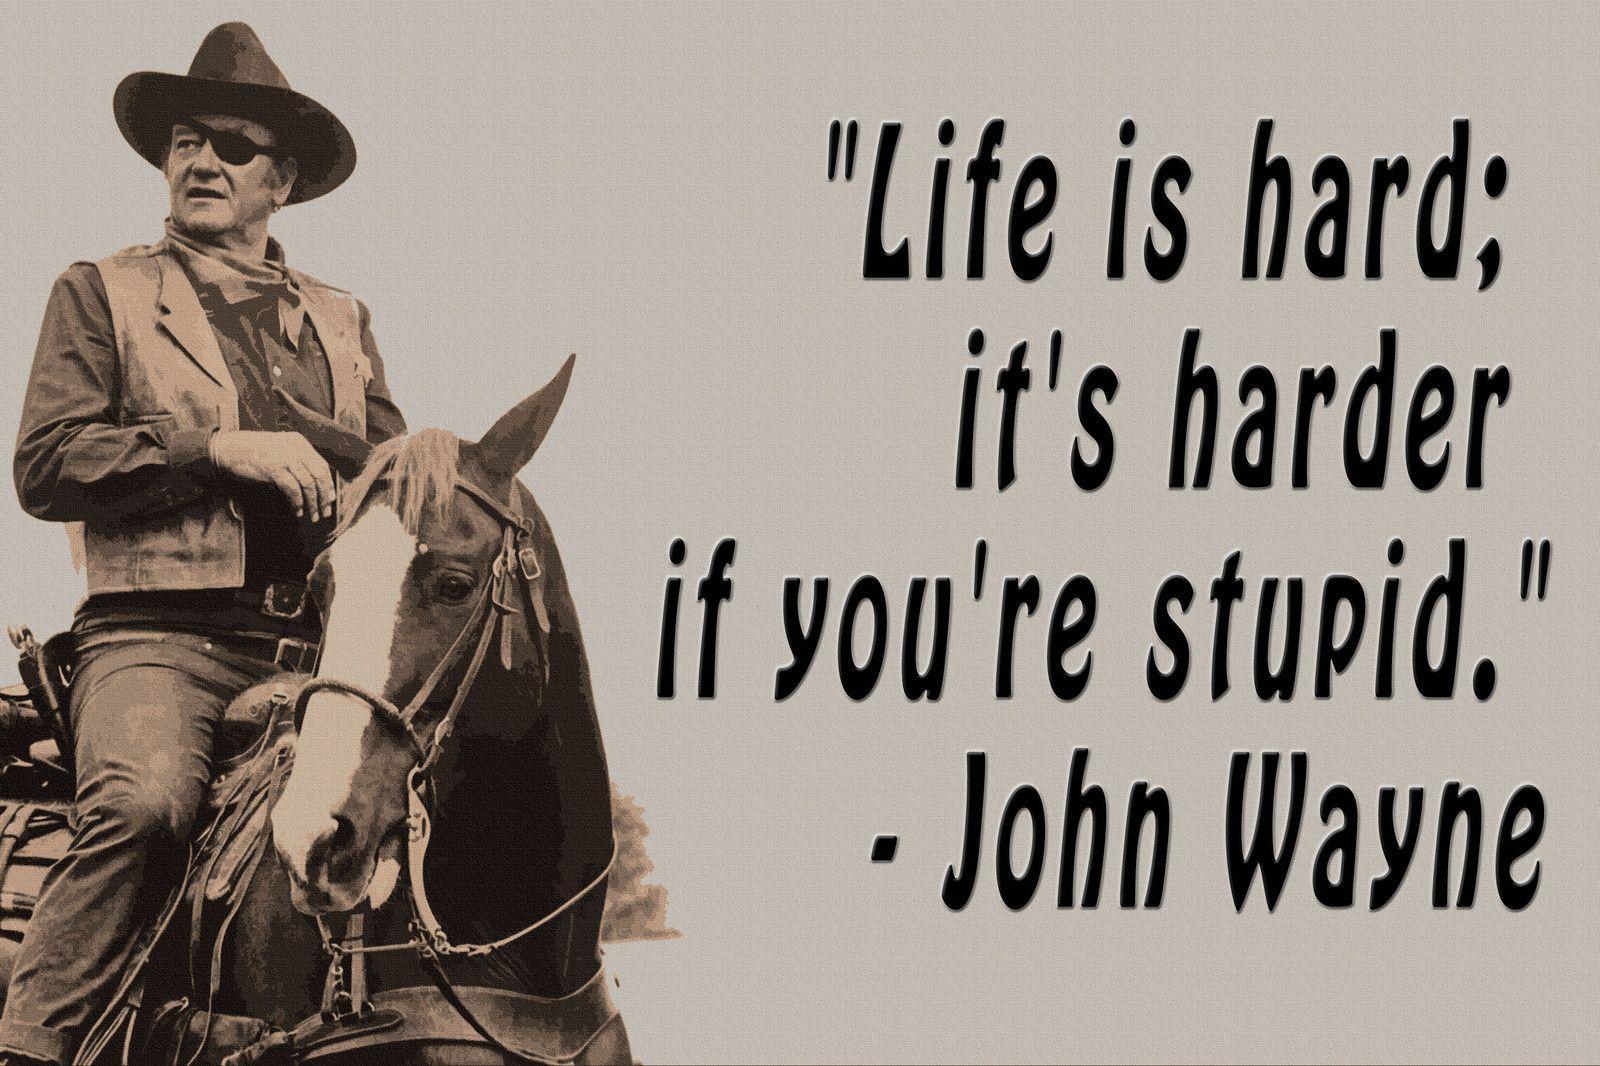 John Wayne Quote Life Is Hard John Wayne  Whosaidit  Pinterest  John Wayne Hard Quotes And